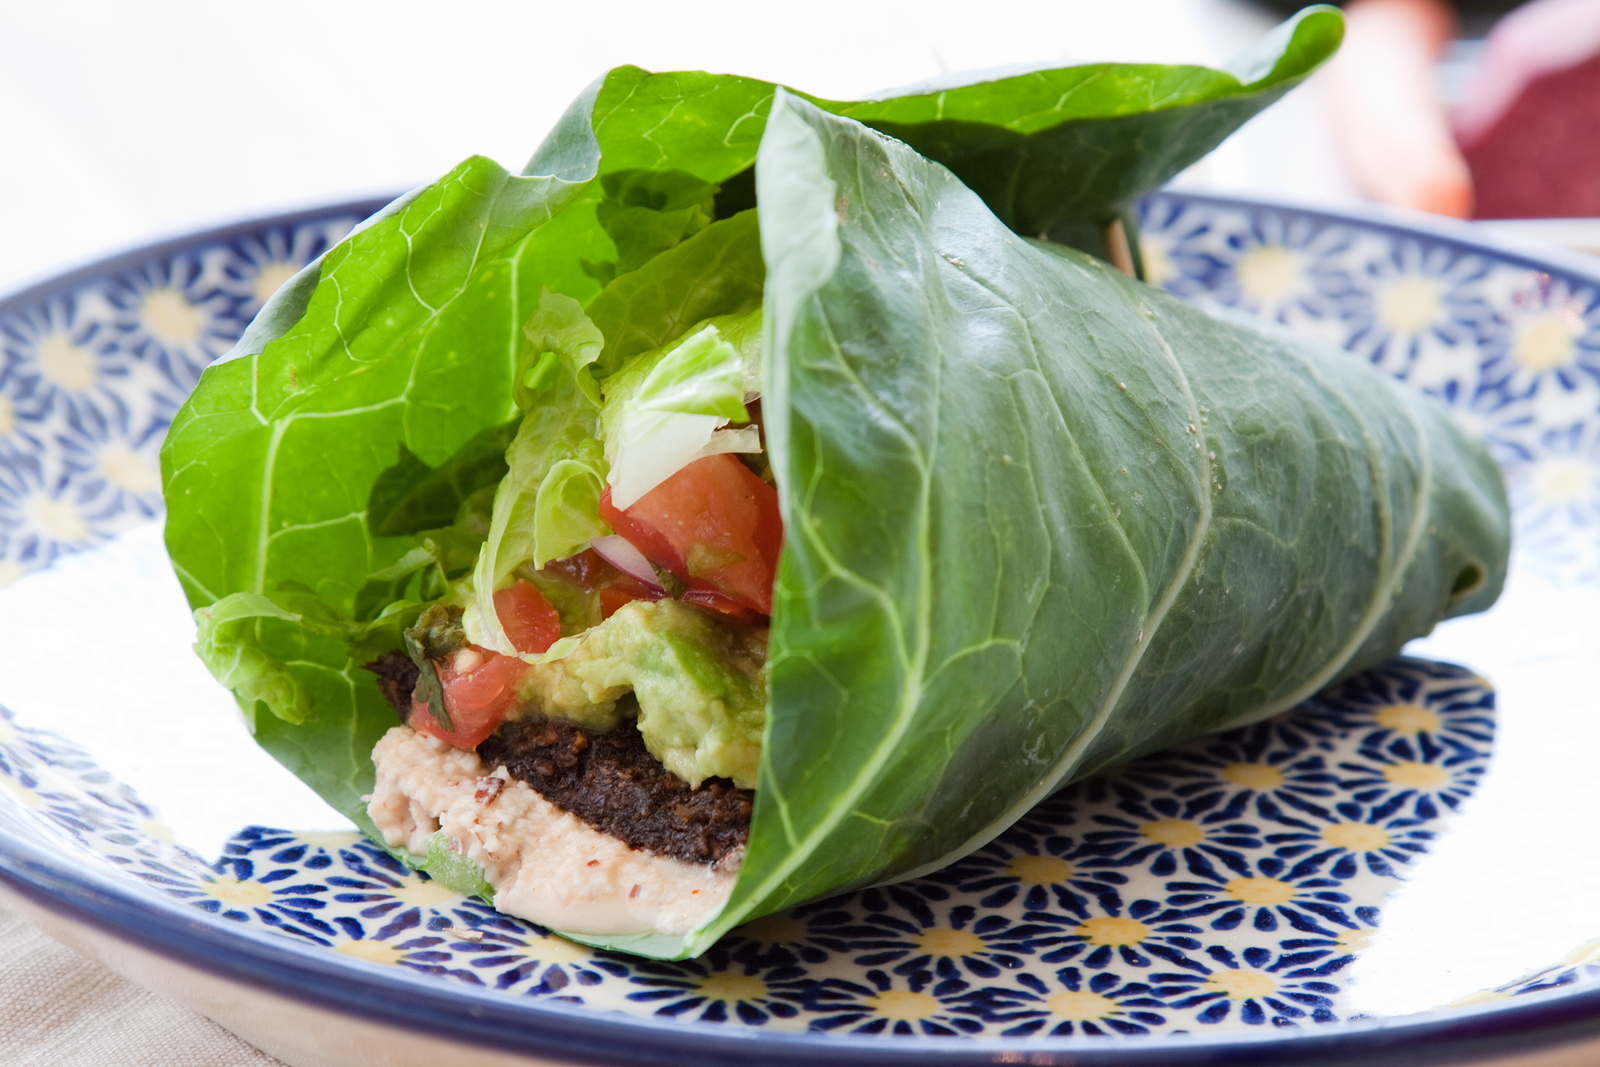 Seasoned nut loaf guacamole romaine lettuce salsa & almond nut cheese wrapped in a collard leaf.